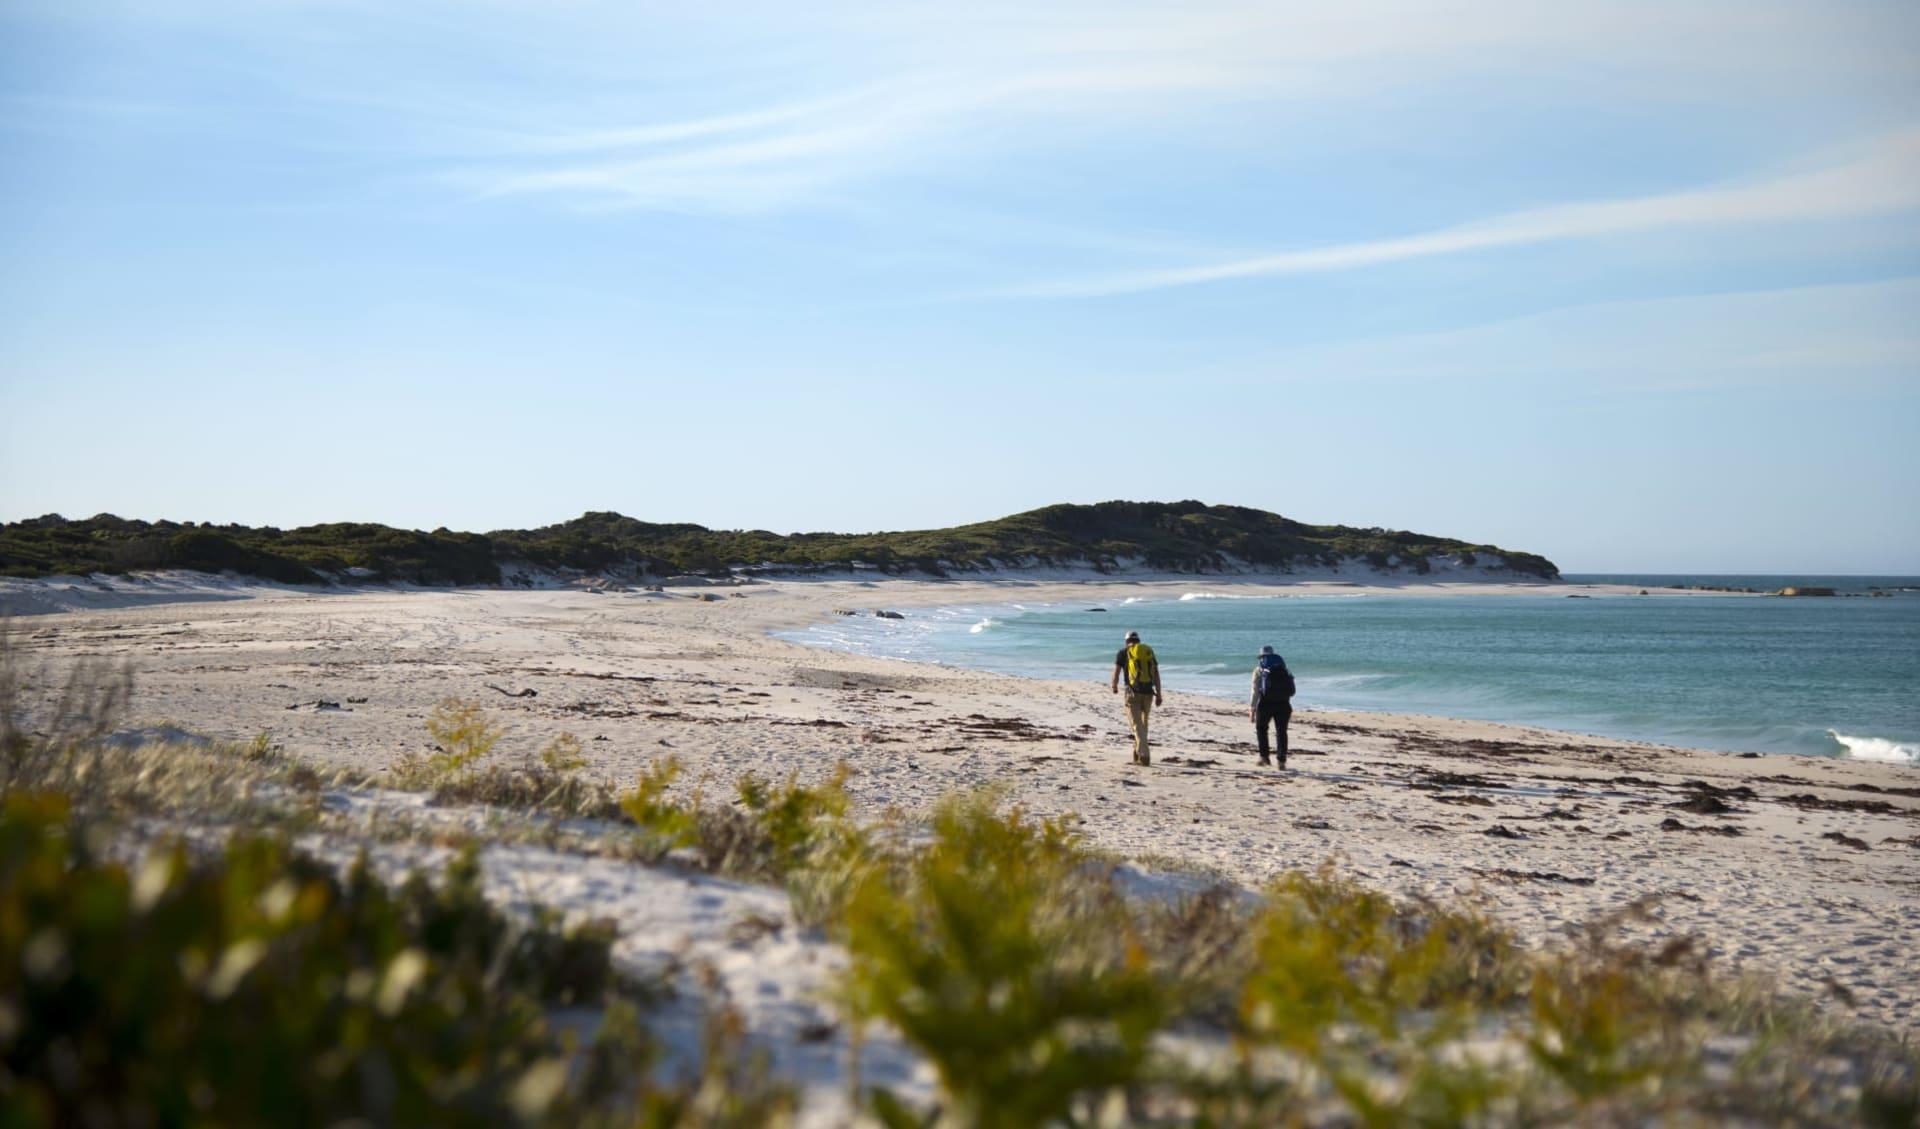 Wukalina Walk ab Launceston: Australia Tasmanien Wukalina Walk Strand